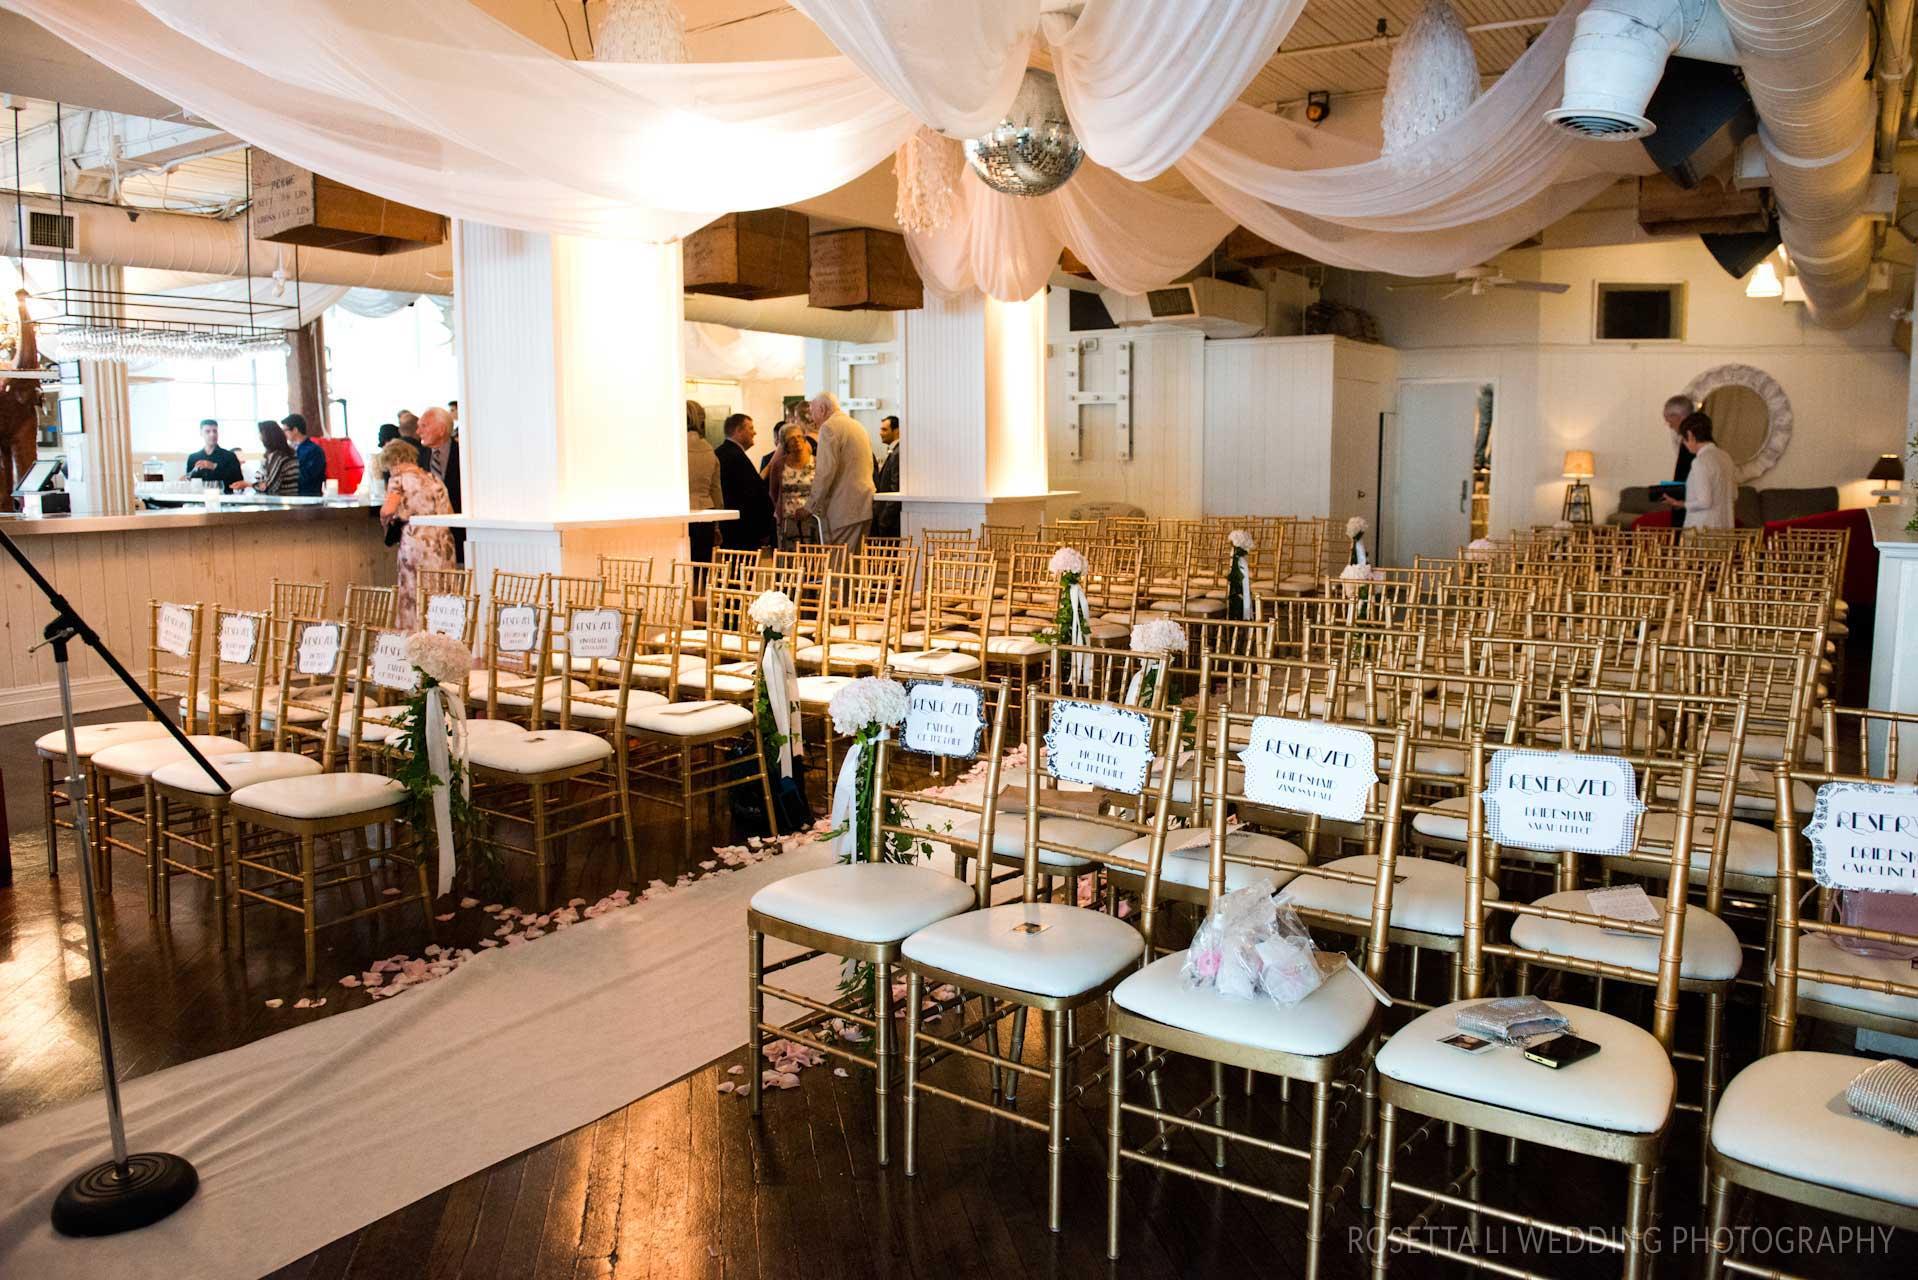 Wedding Venues Toronto - Wedding Ceremony - Chiavari Chairs - Urban Loft